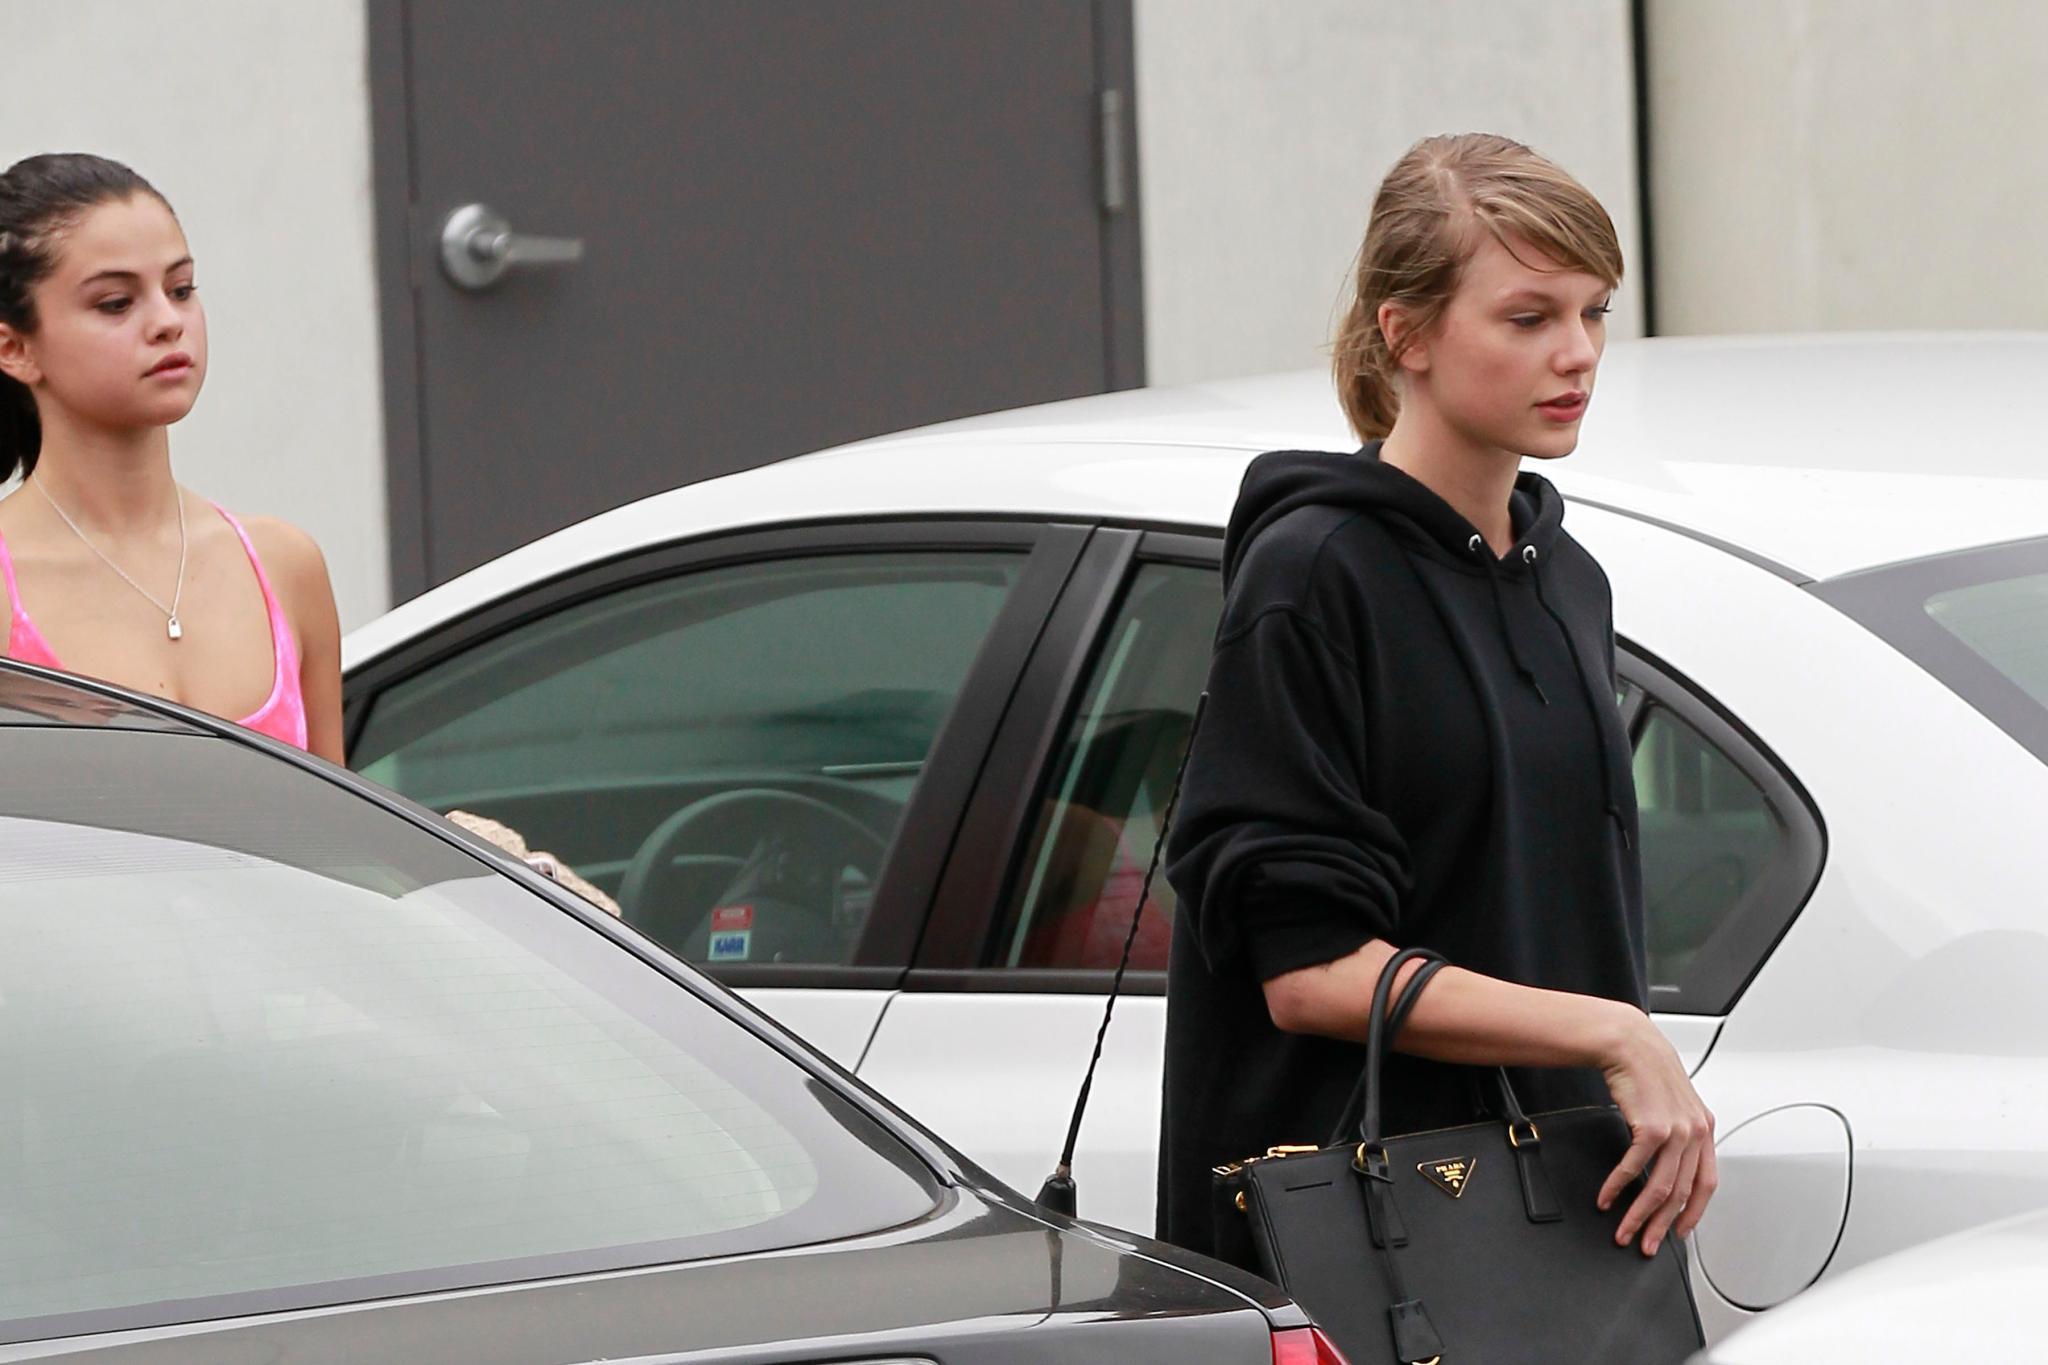 Taylor Swift + Selena Gomez: Spotted! Zwei Superstars au naturel.